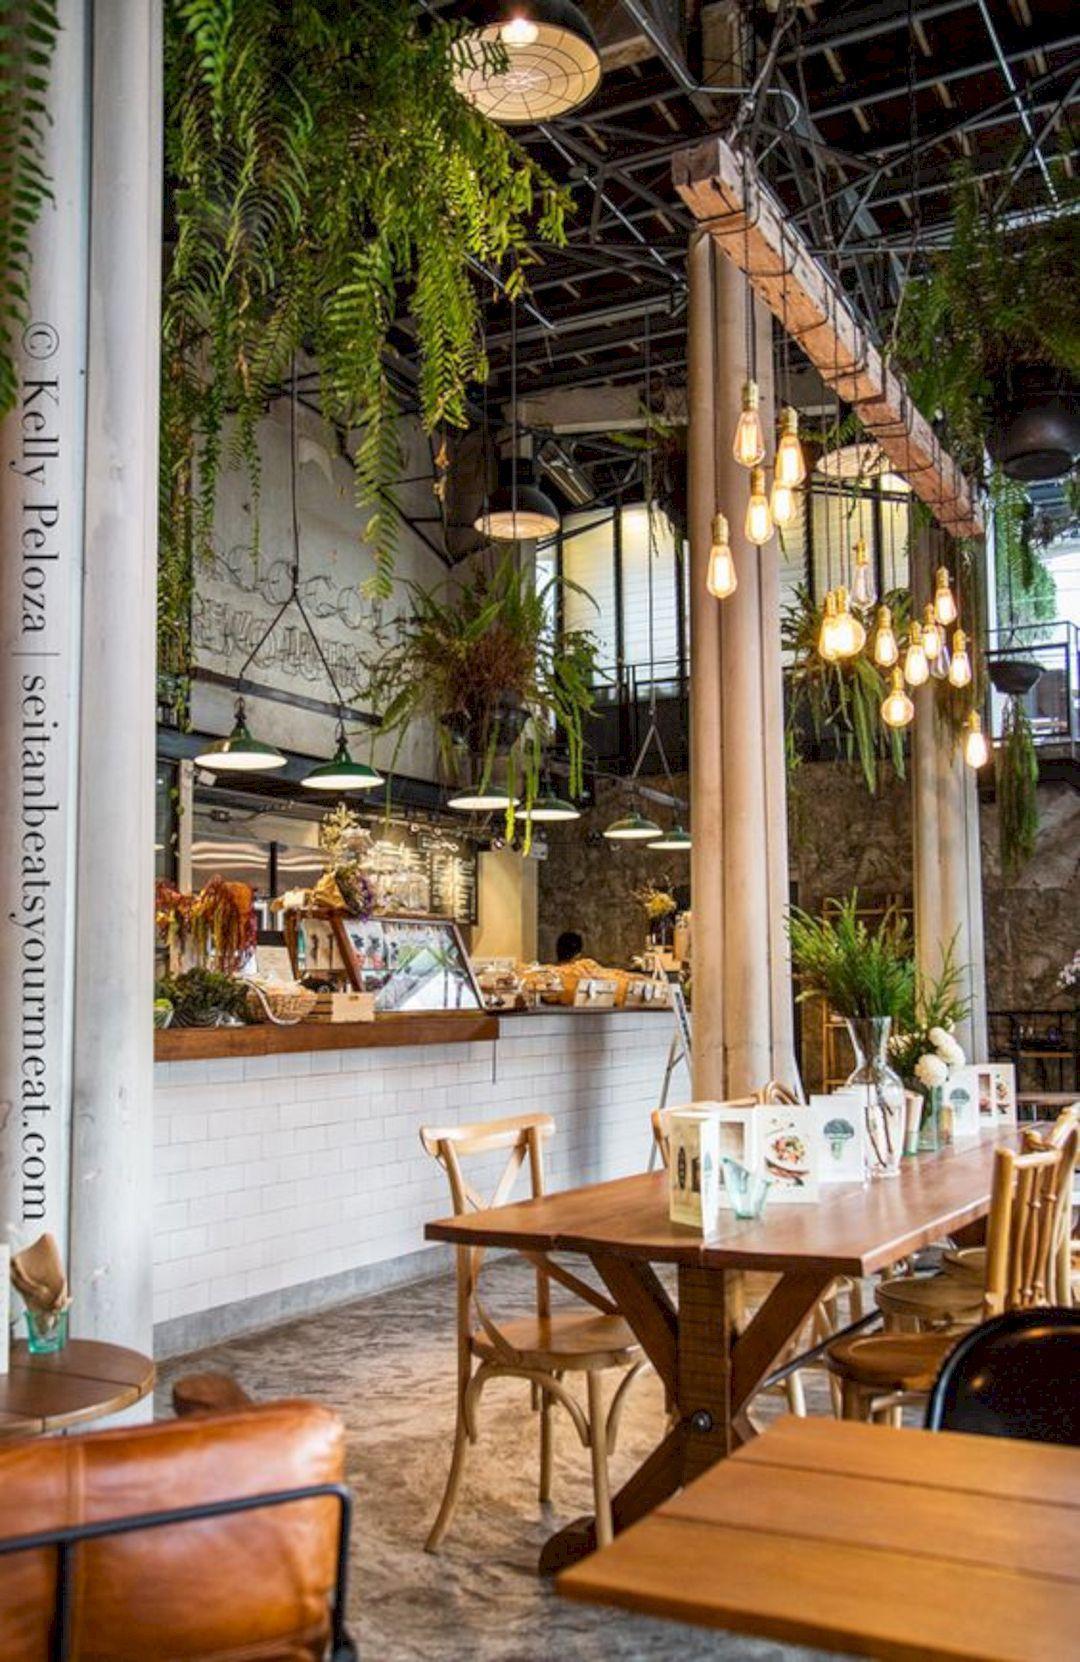 15 Stylish Interior Design Ideas For Thai Restaurant Restaurant Interior Cafe Interior Design Cafe Decor